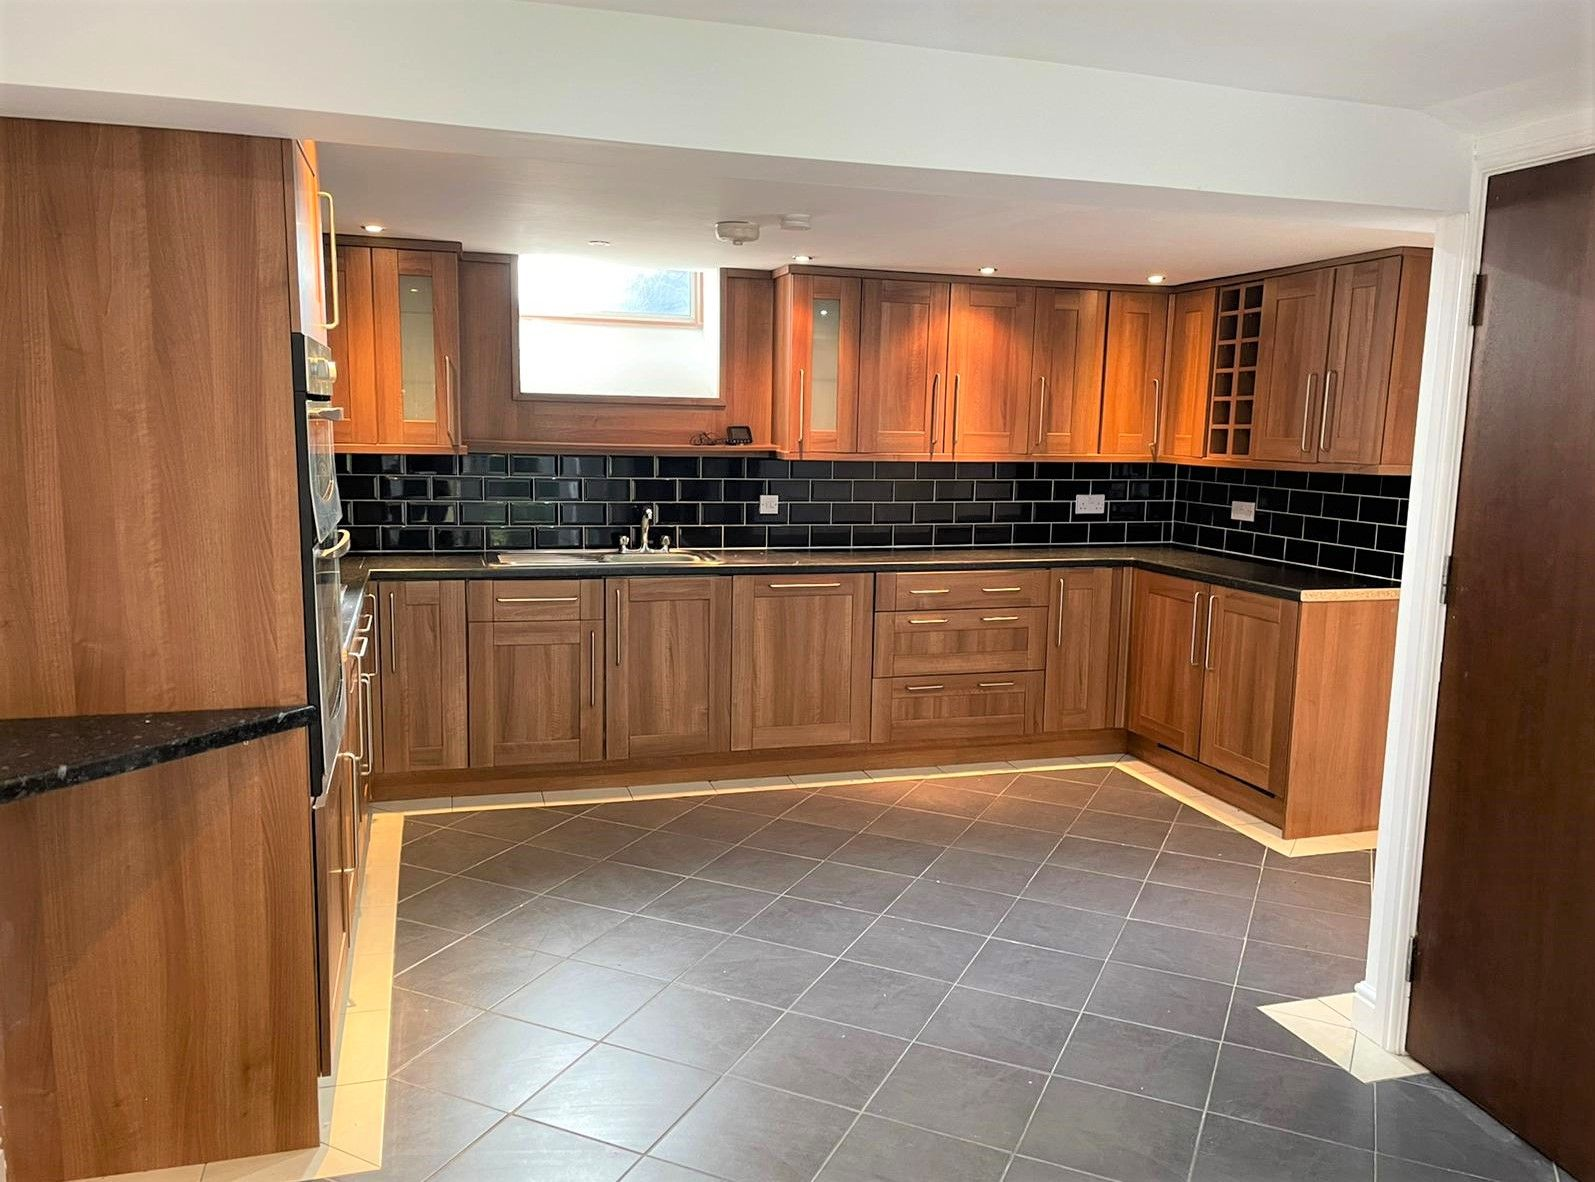 Property photo 1 of 8. Kitchen